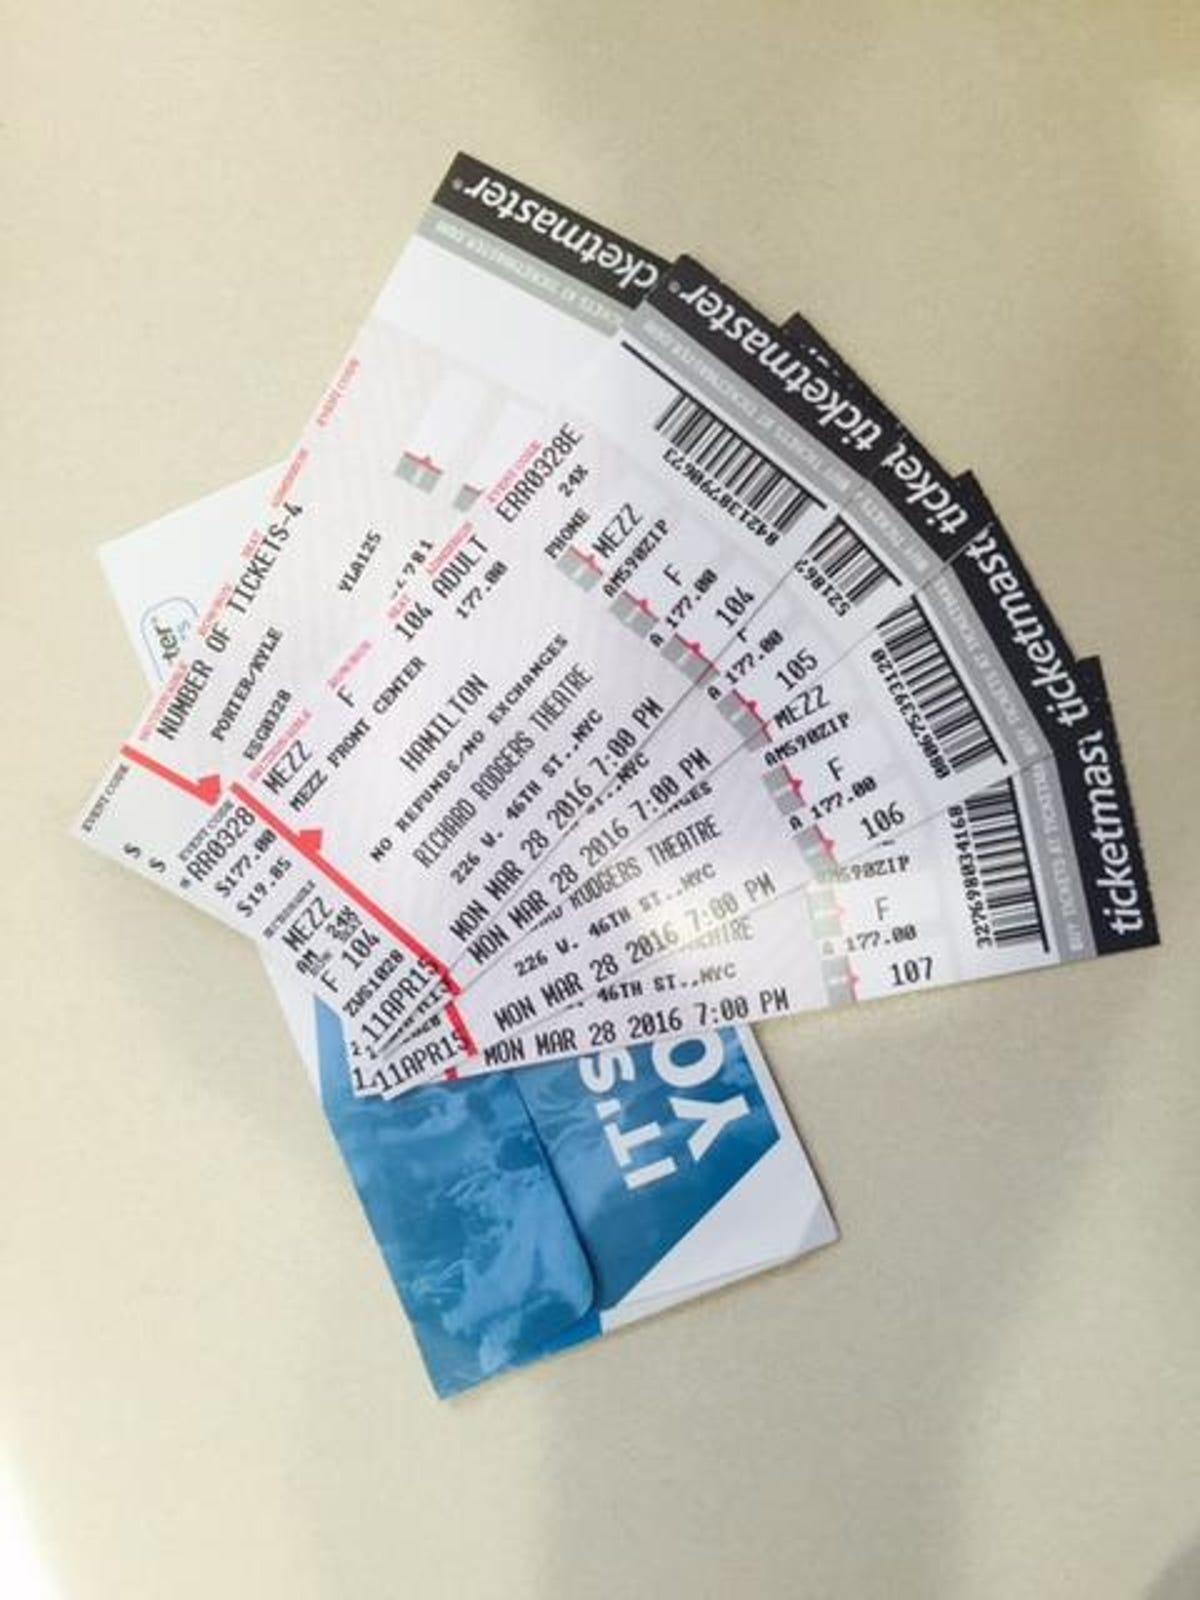 Hamilton' fans burned by fake tickets